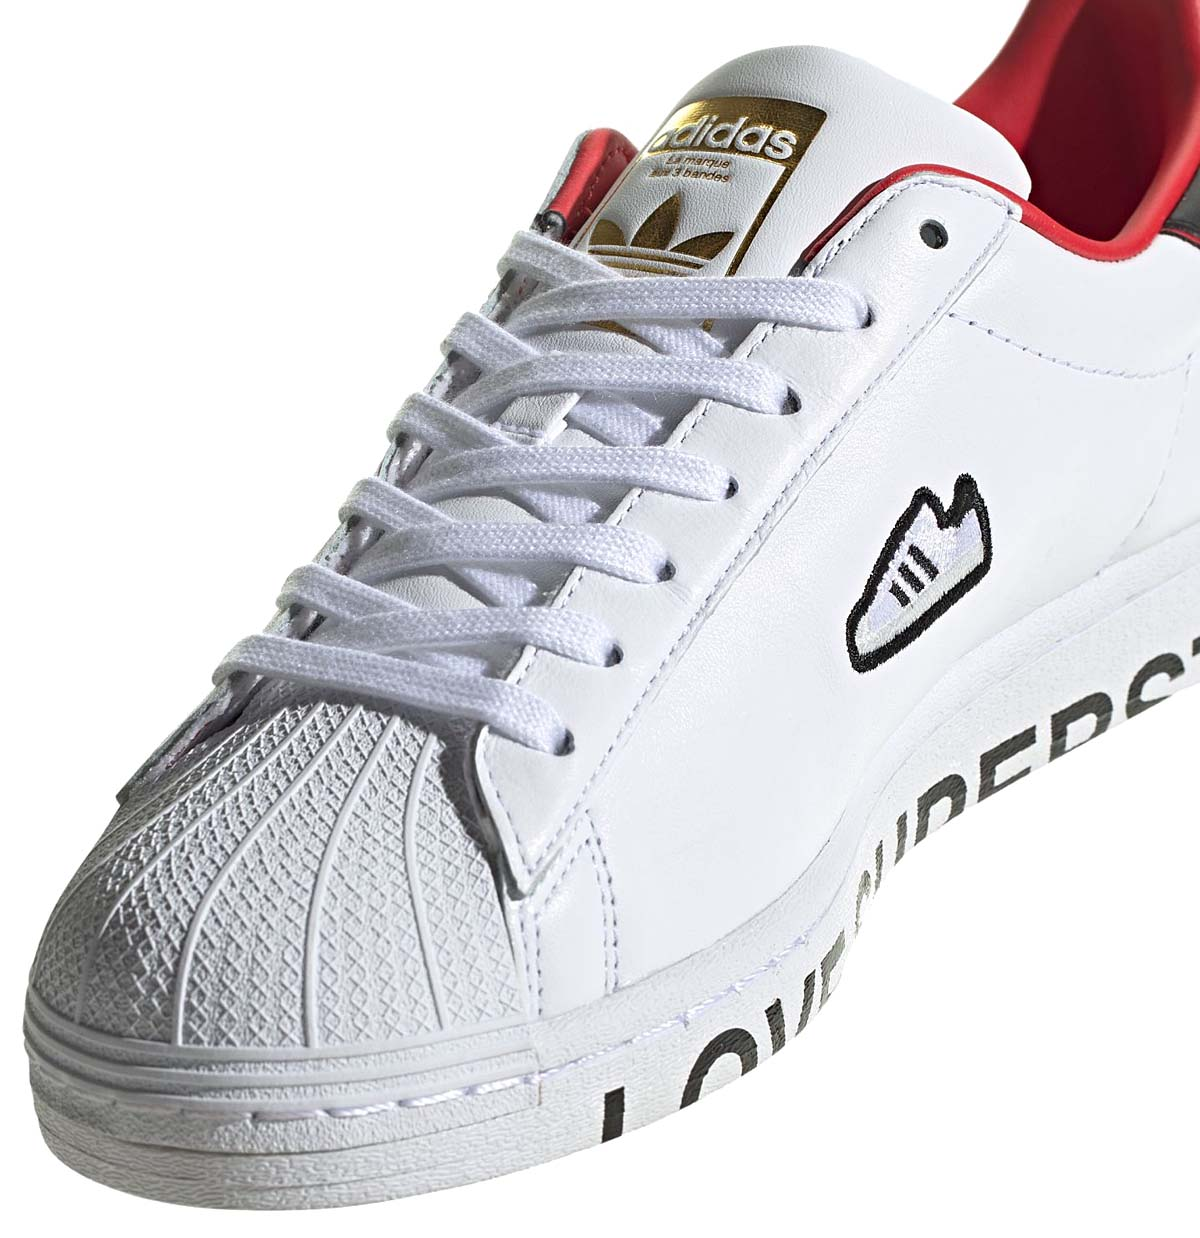 adidas SUPERSTAR FOOTWEAR WHITE / CORE BLACK / SCARLET FW6384 アディダス スーパースター ホワイト/ブラック/レッド